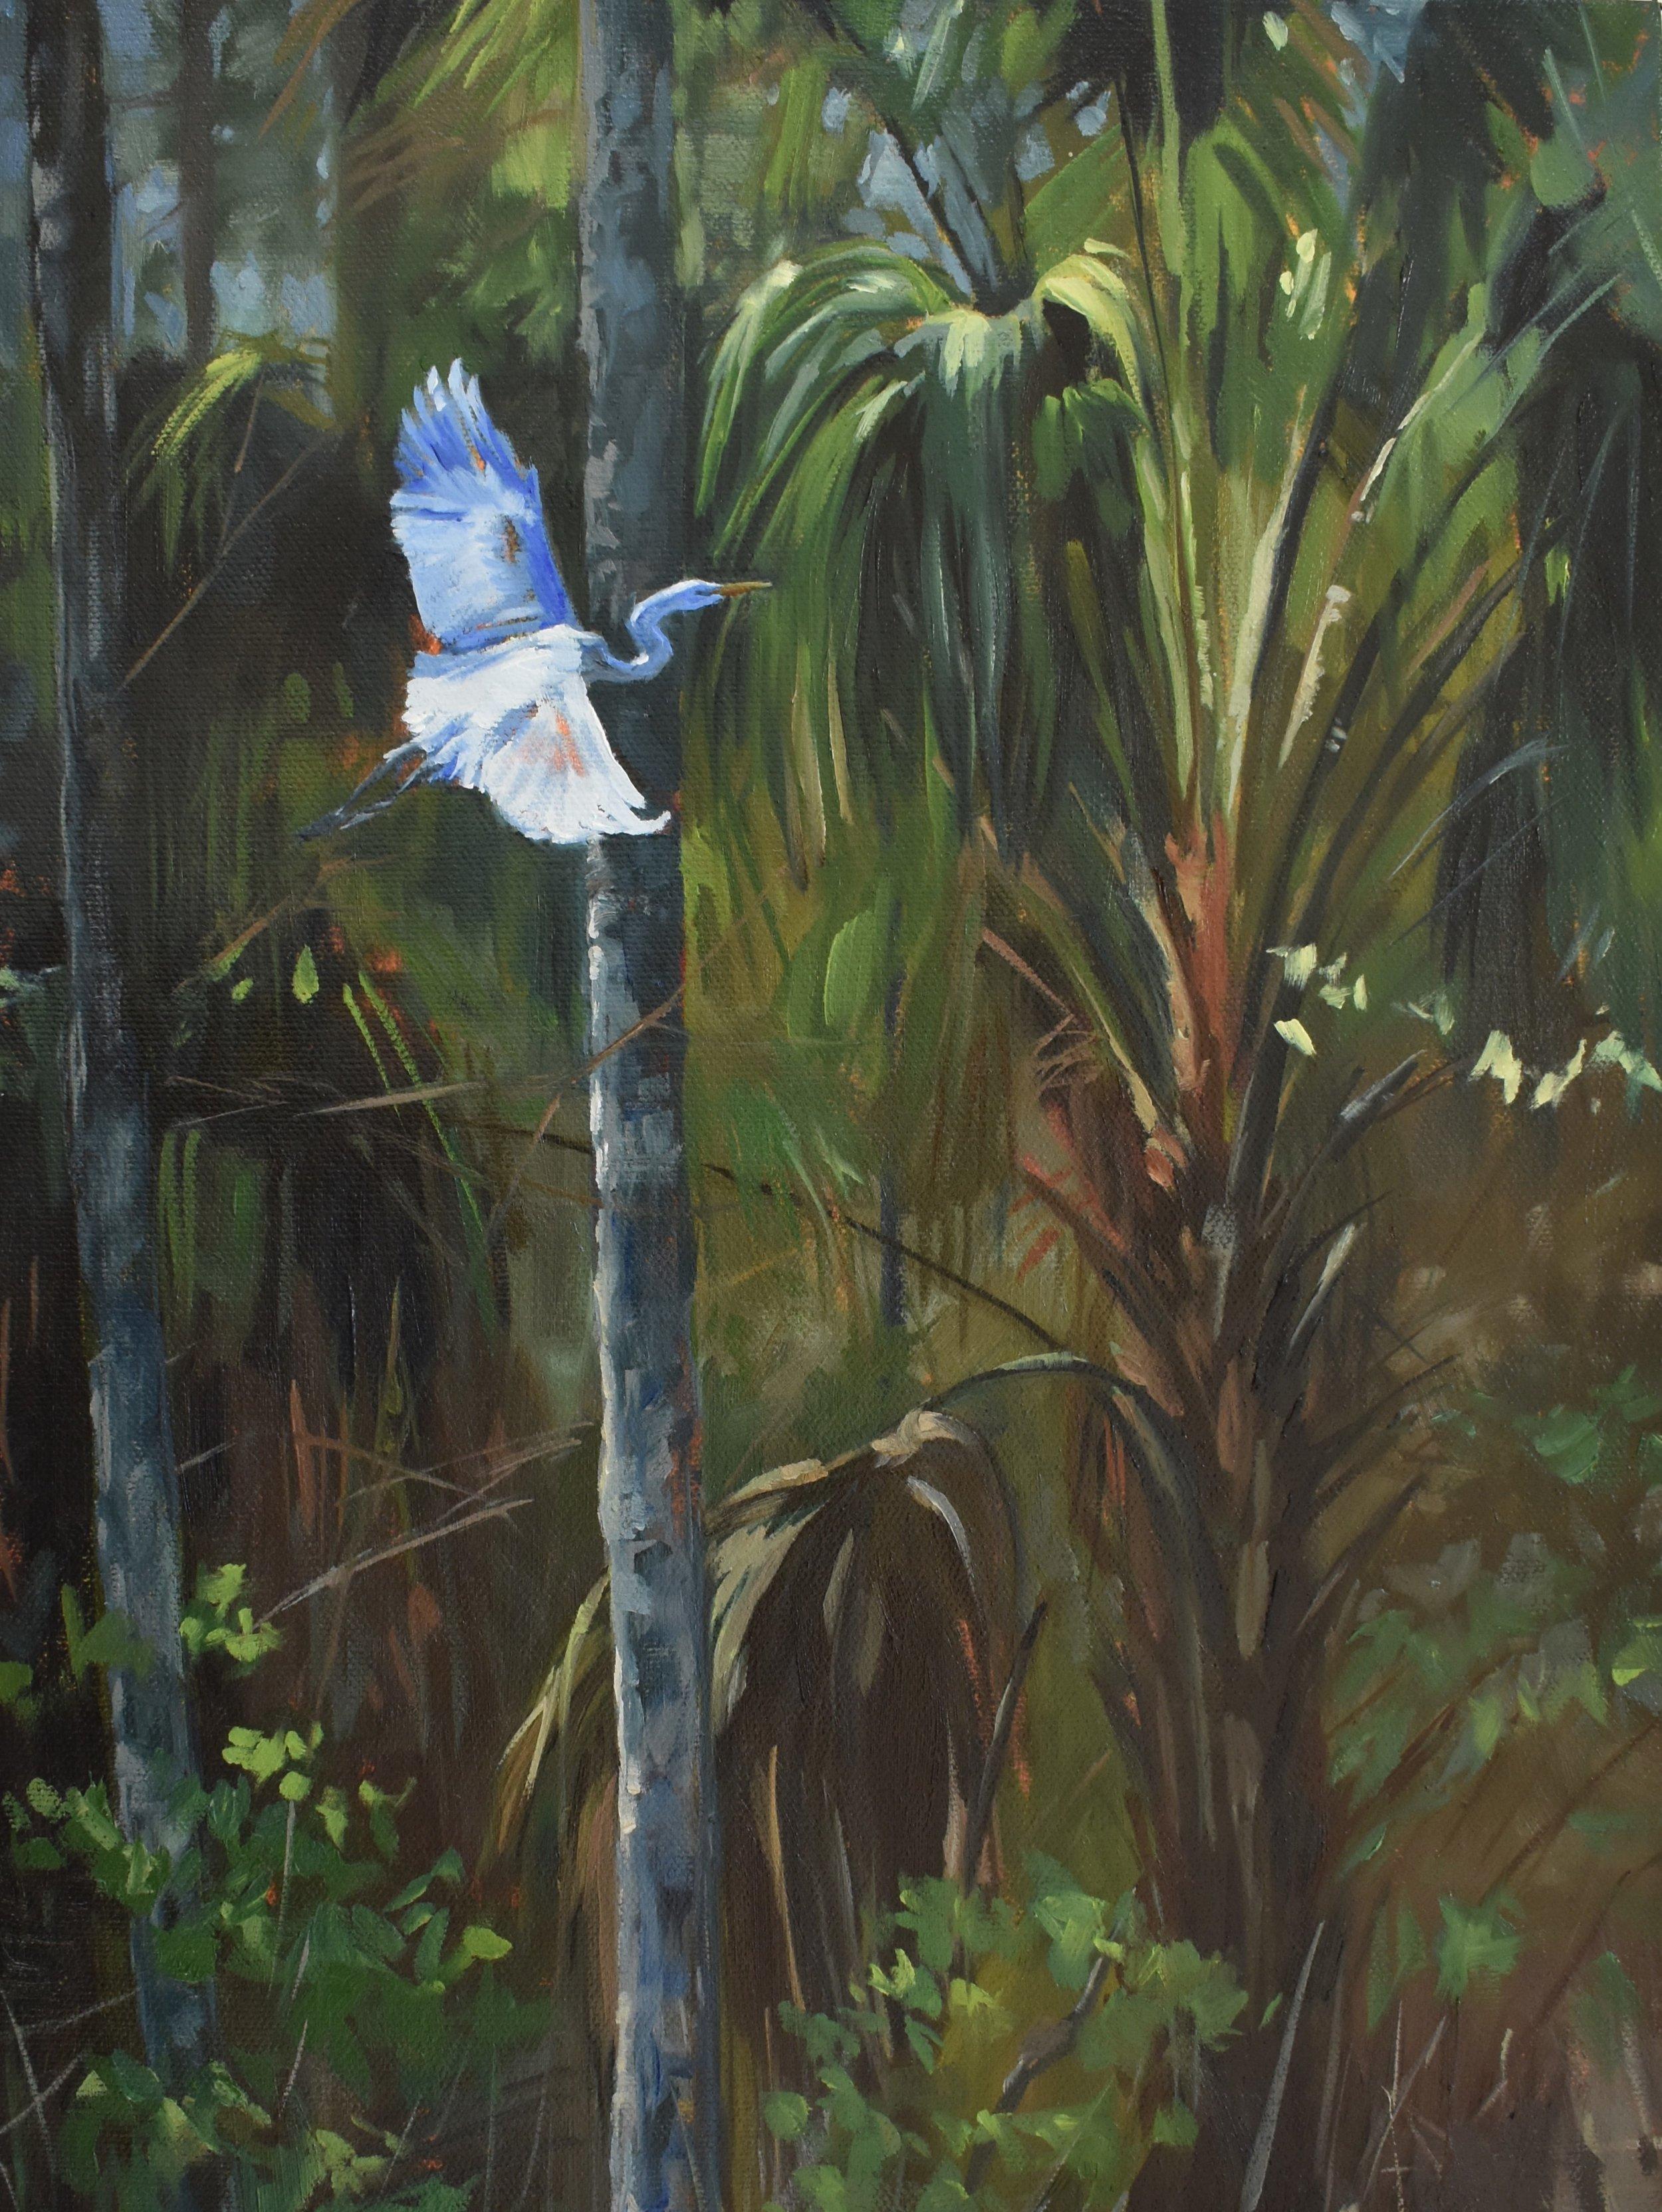 egret and palm raw file 72dpi.jpg